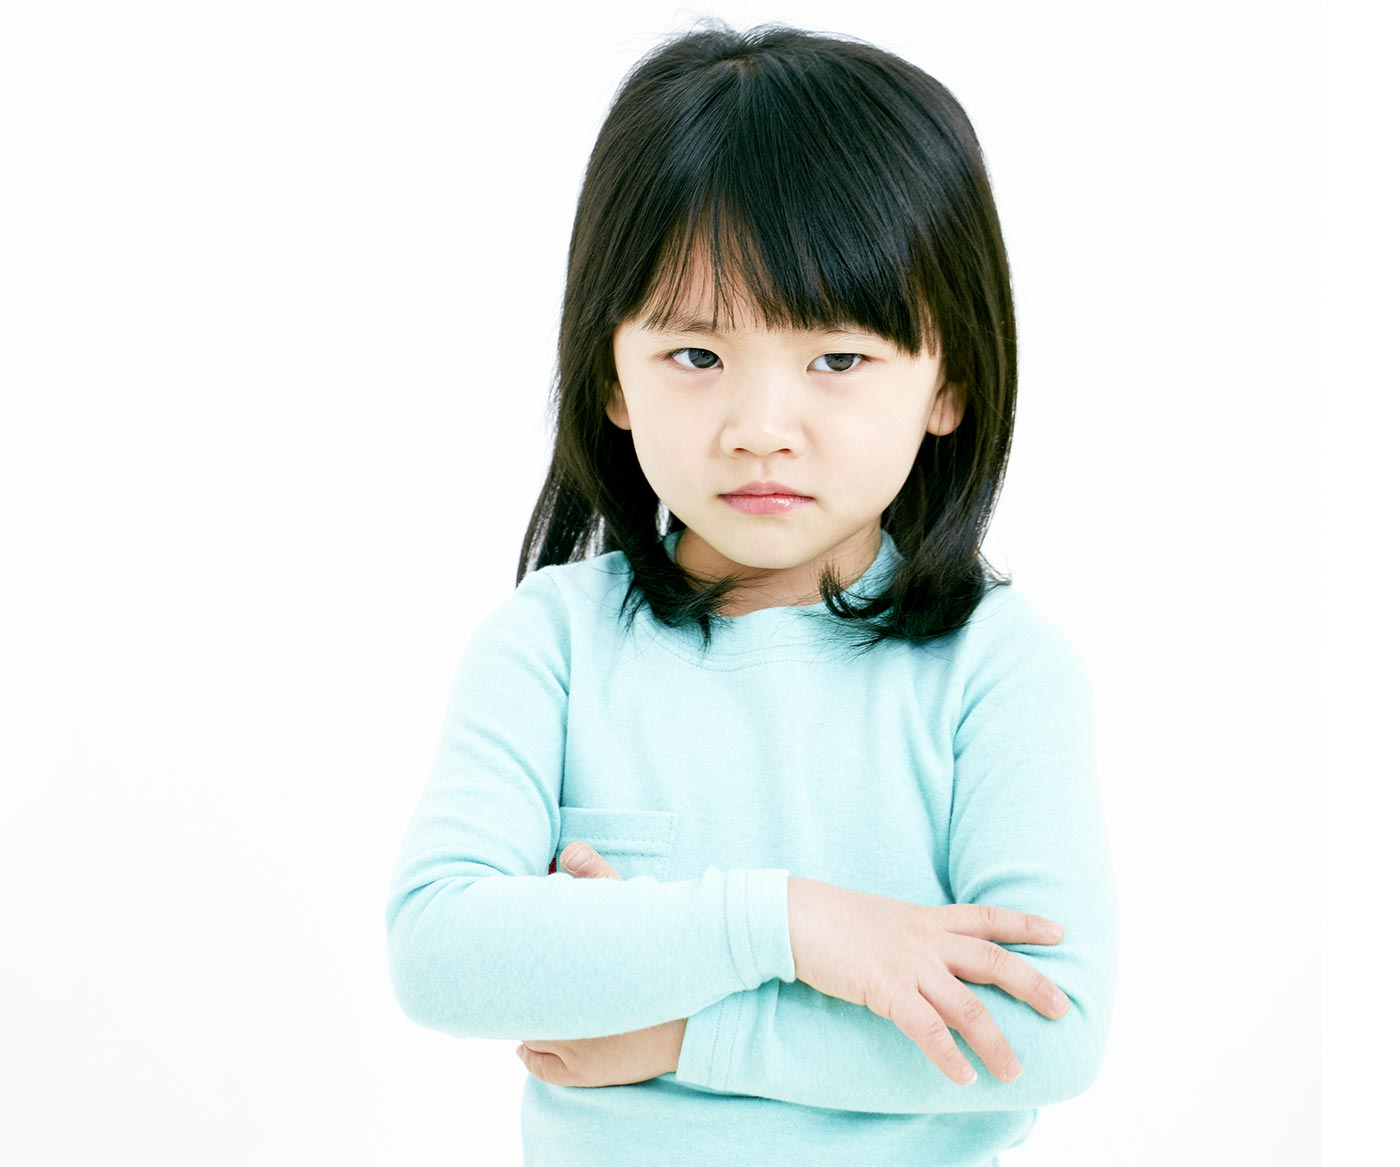 Grumpy little girl: 3 ways we unintentionally disrespect kids